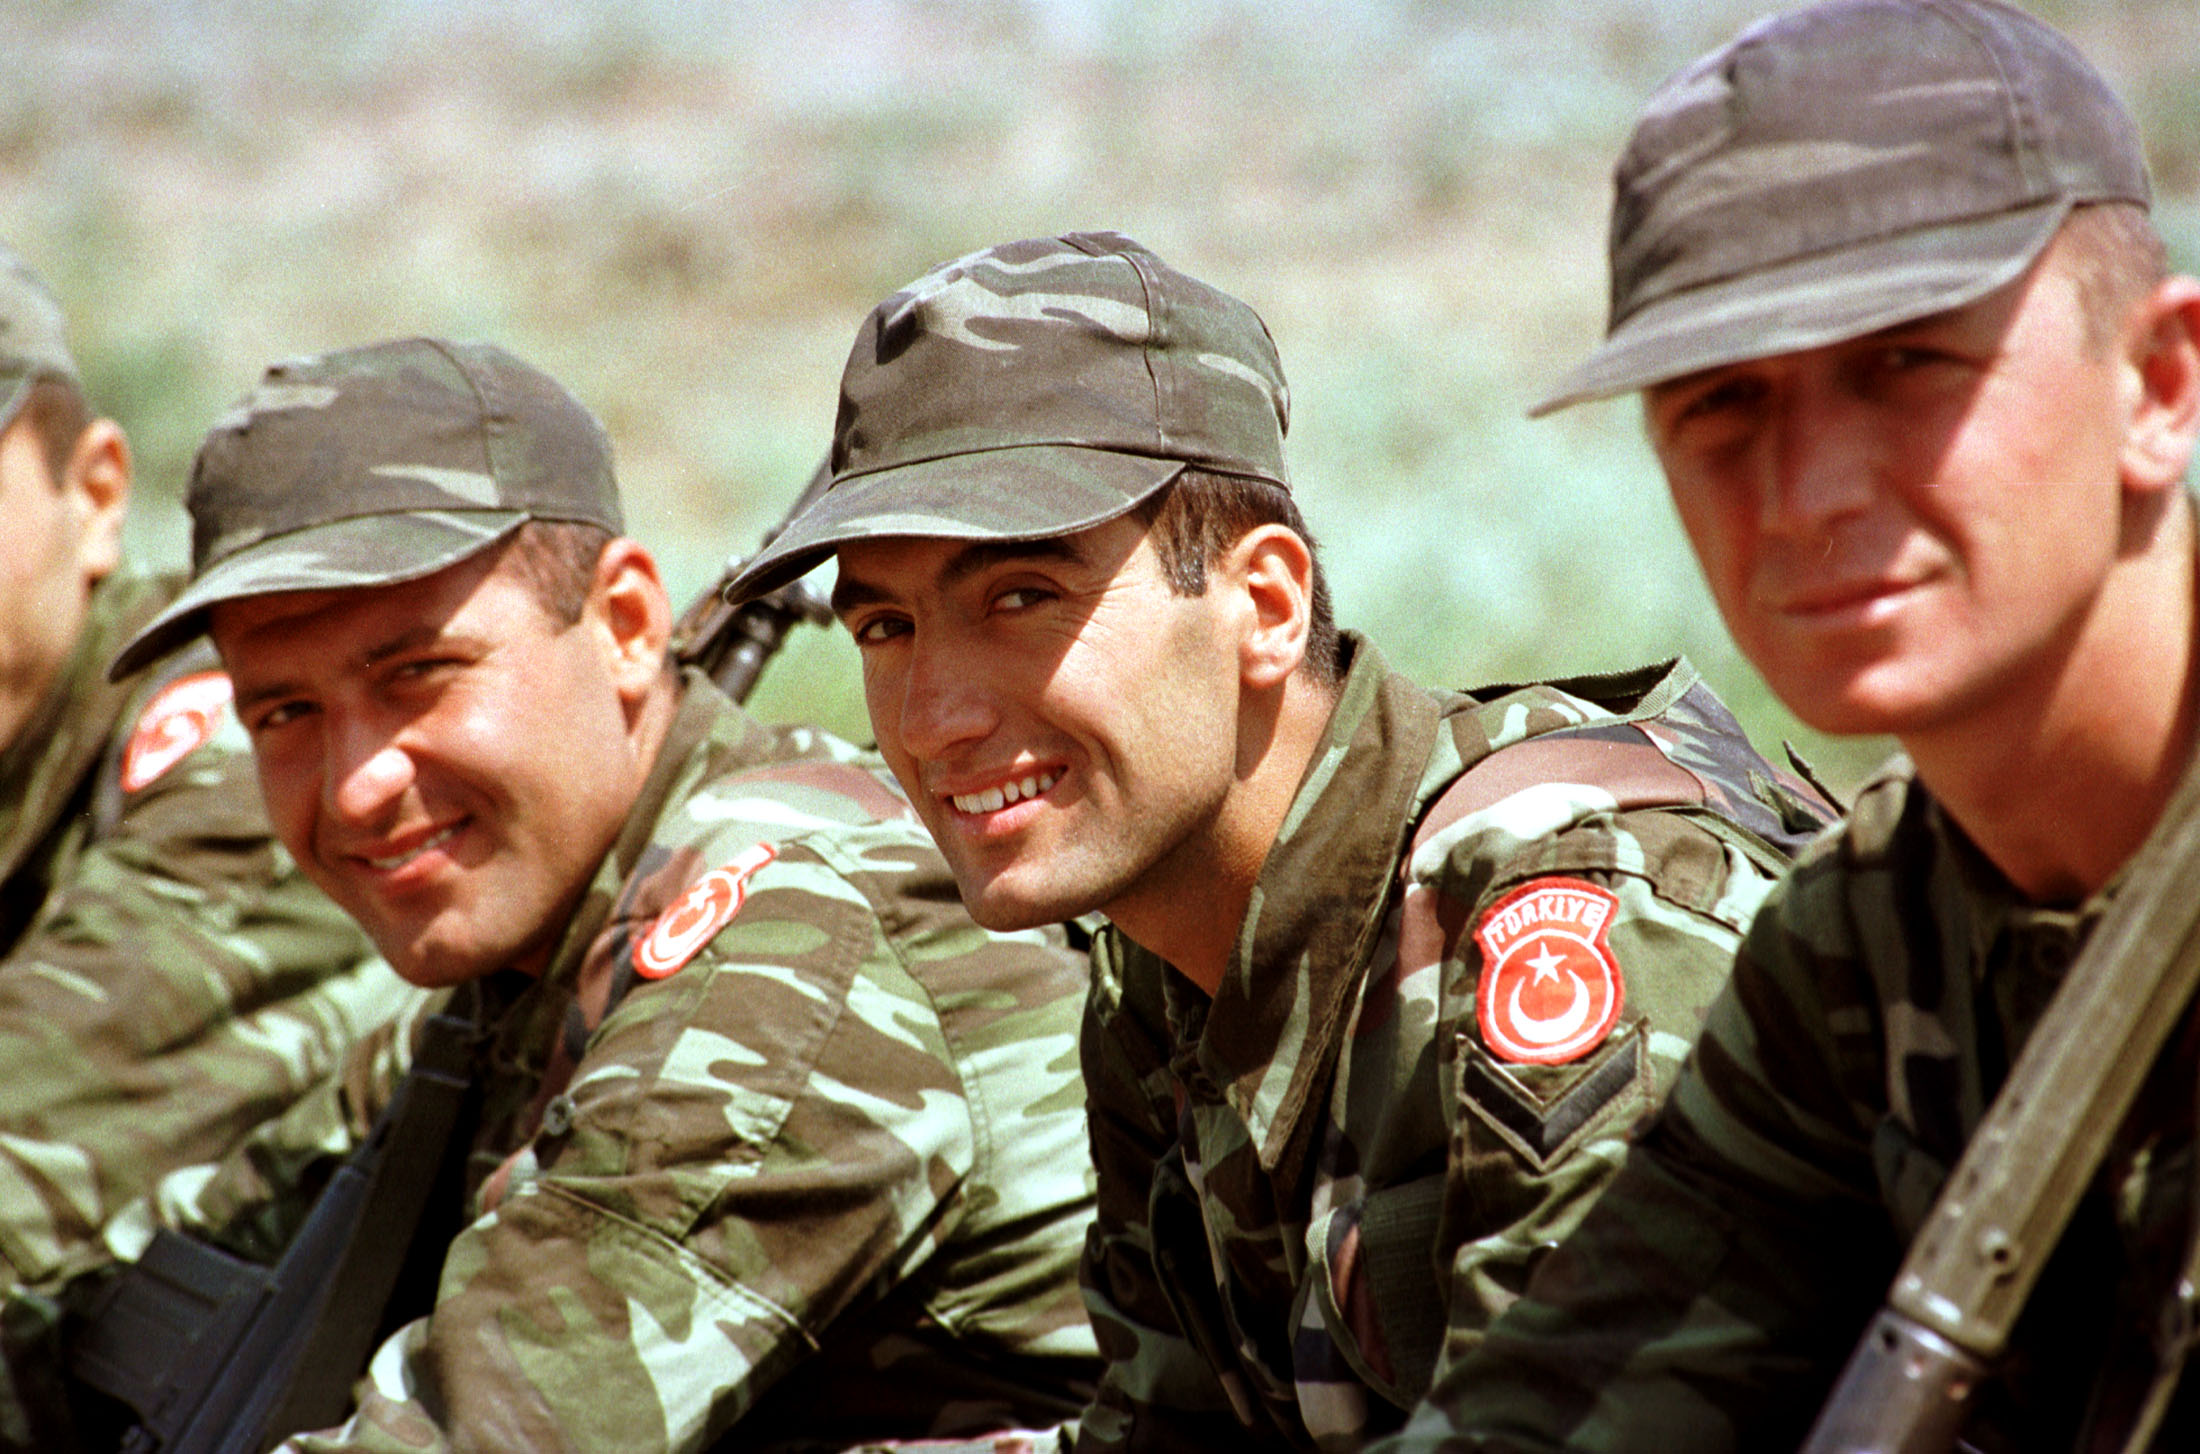 Turkish military has authorization for attacks on Kurdish rebels